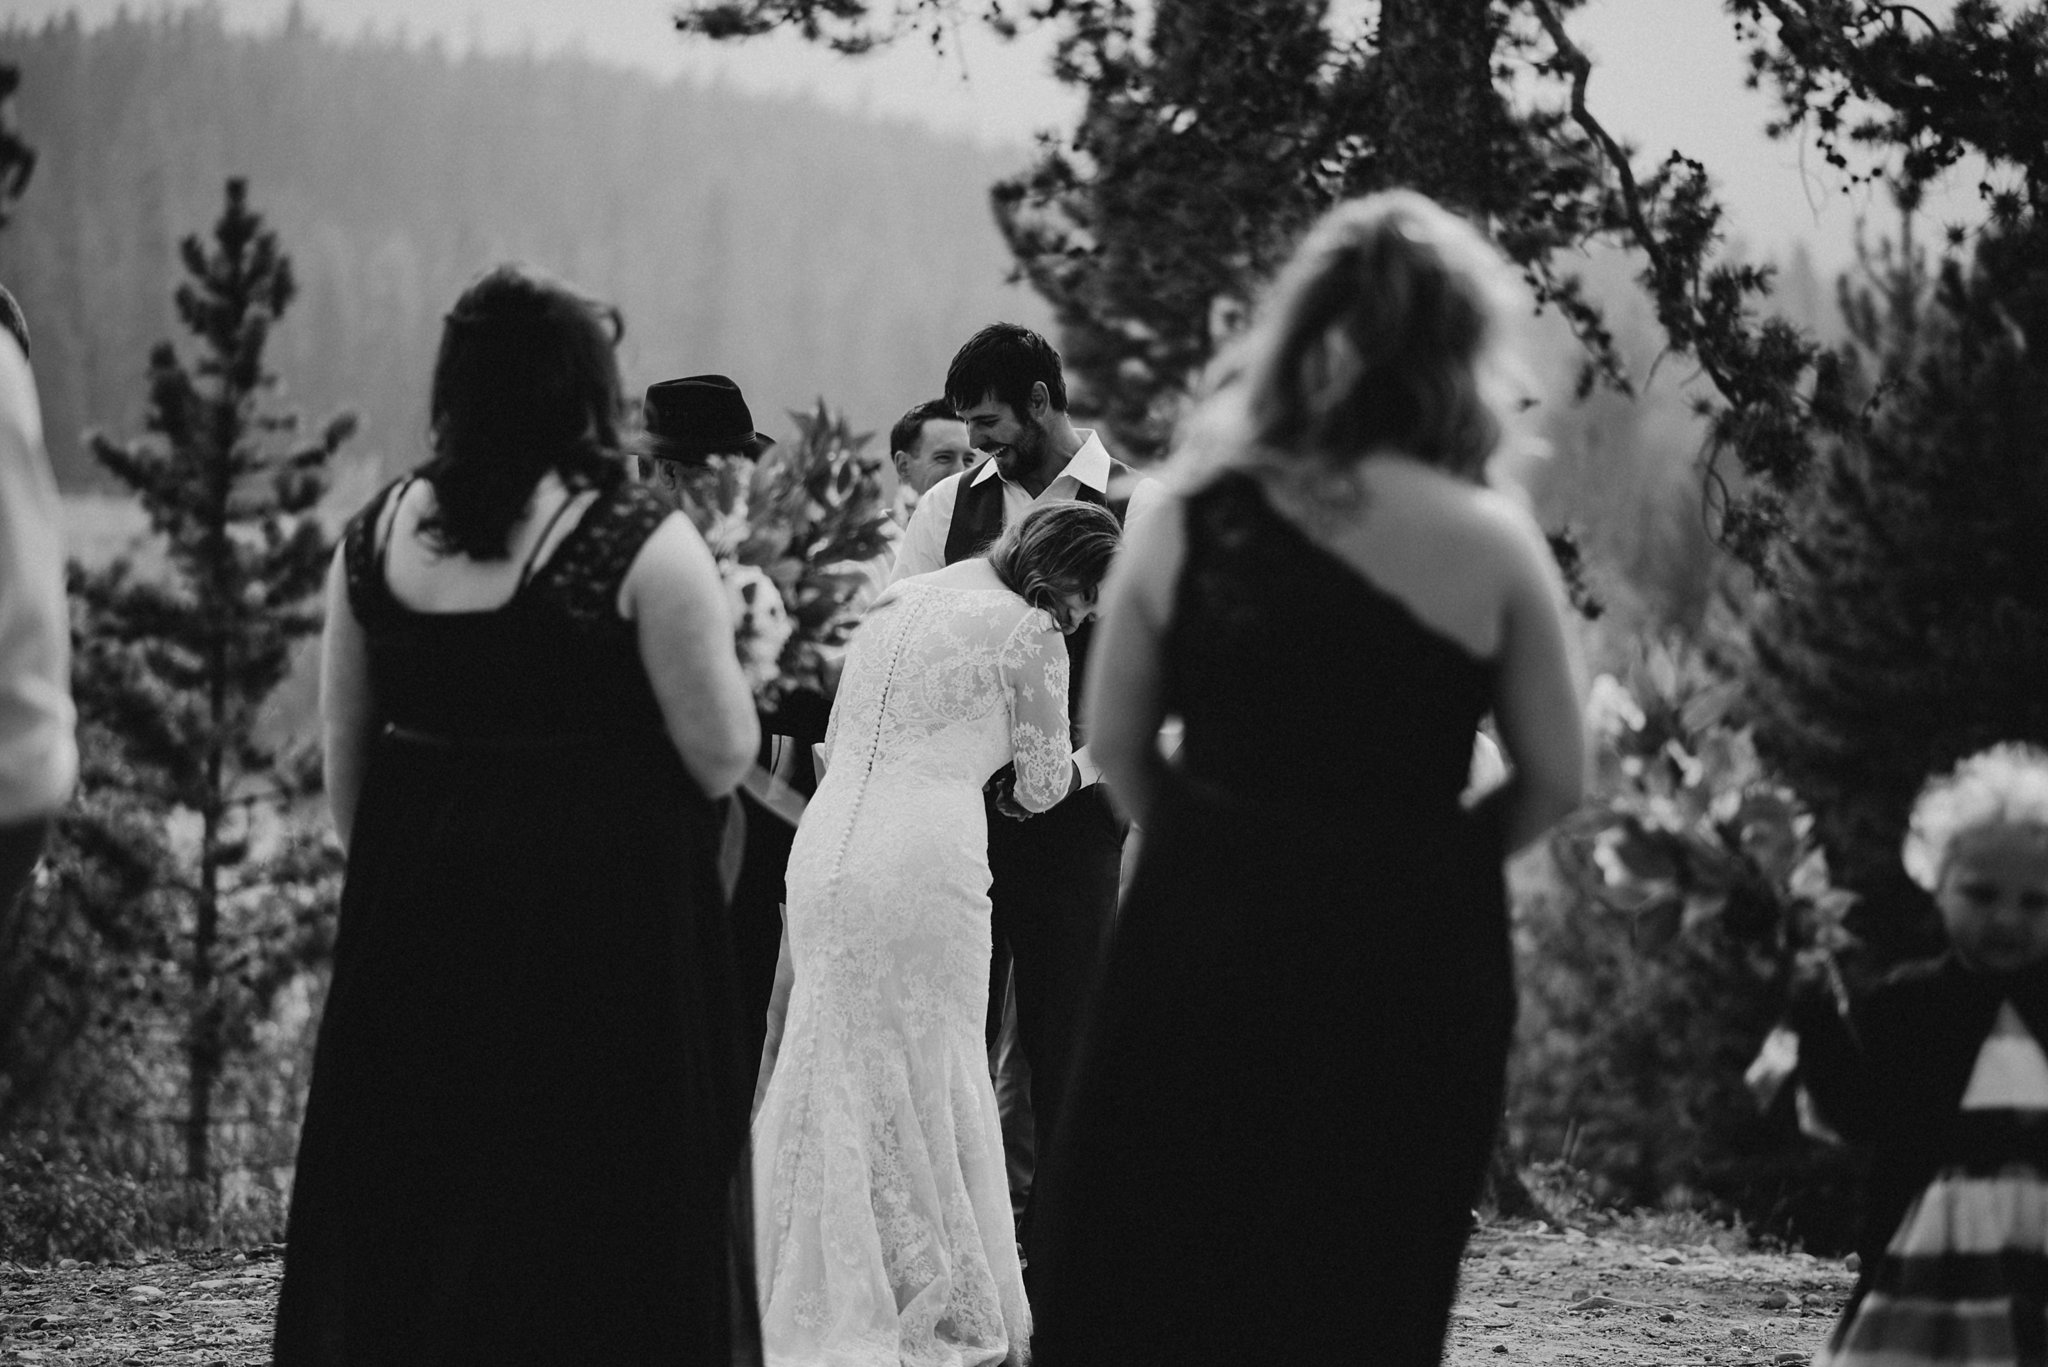 kaihla_tonai_intimate_wedding_elopement_photographer_6723.jpg